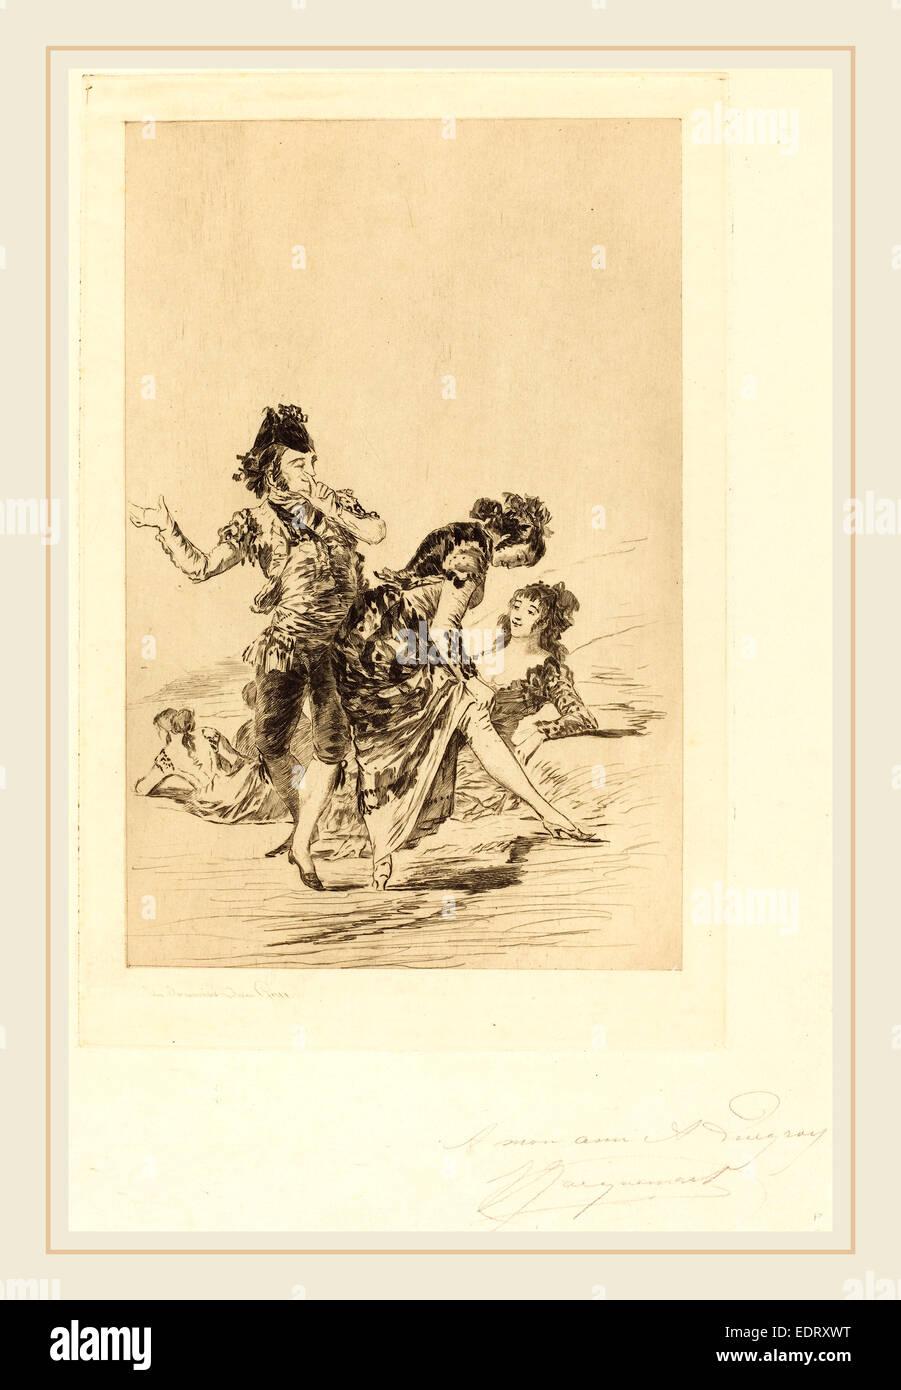 Jules-Ferdinand Jacquemart after Francisco de Goya (French, 1837-1880), Spanish Scene (Scène espagnole), 1863, - Stock Image